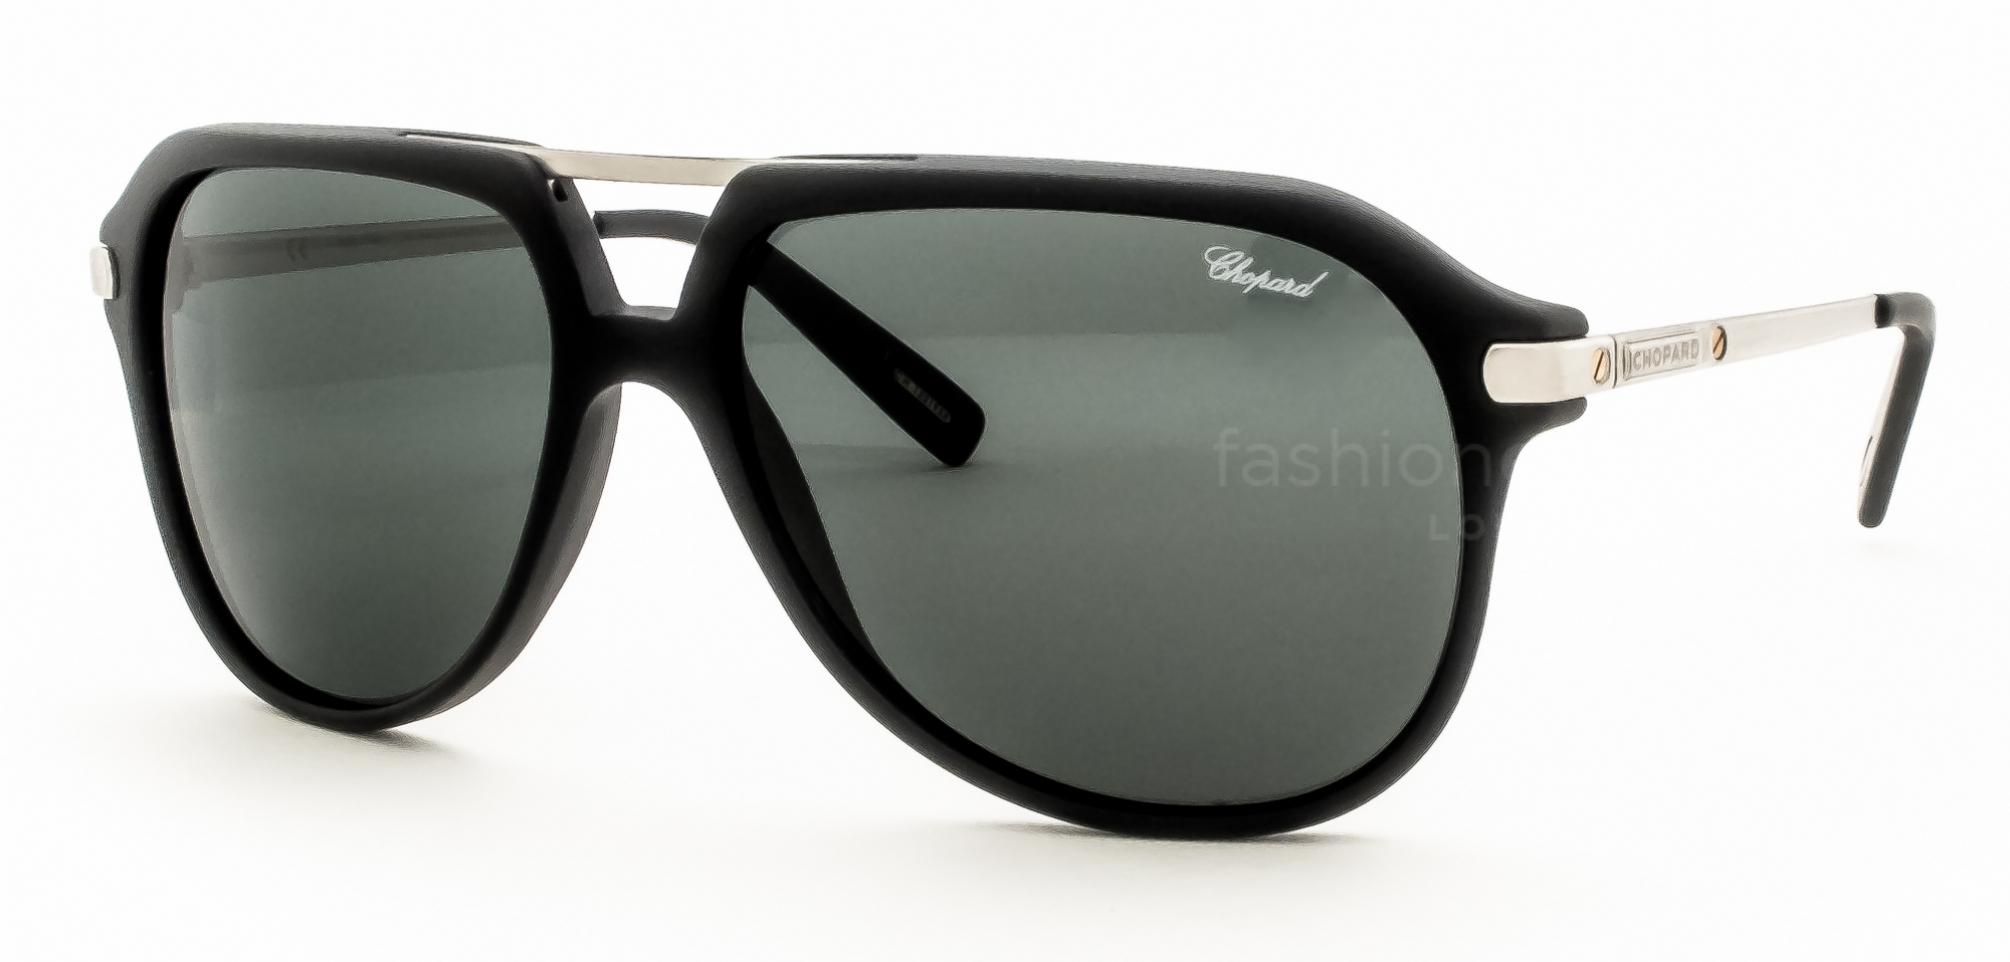 1ca5729dbcb Buy Chopard Sunglasses directly from OpticsFast.com